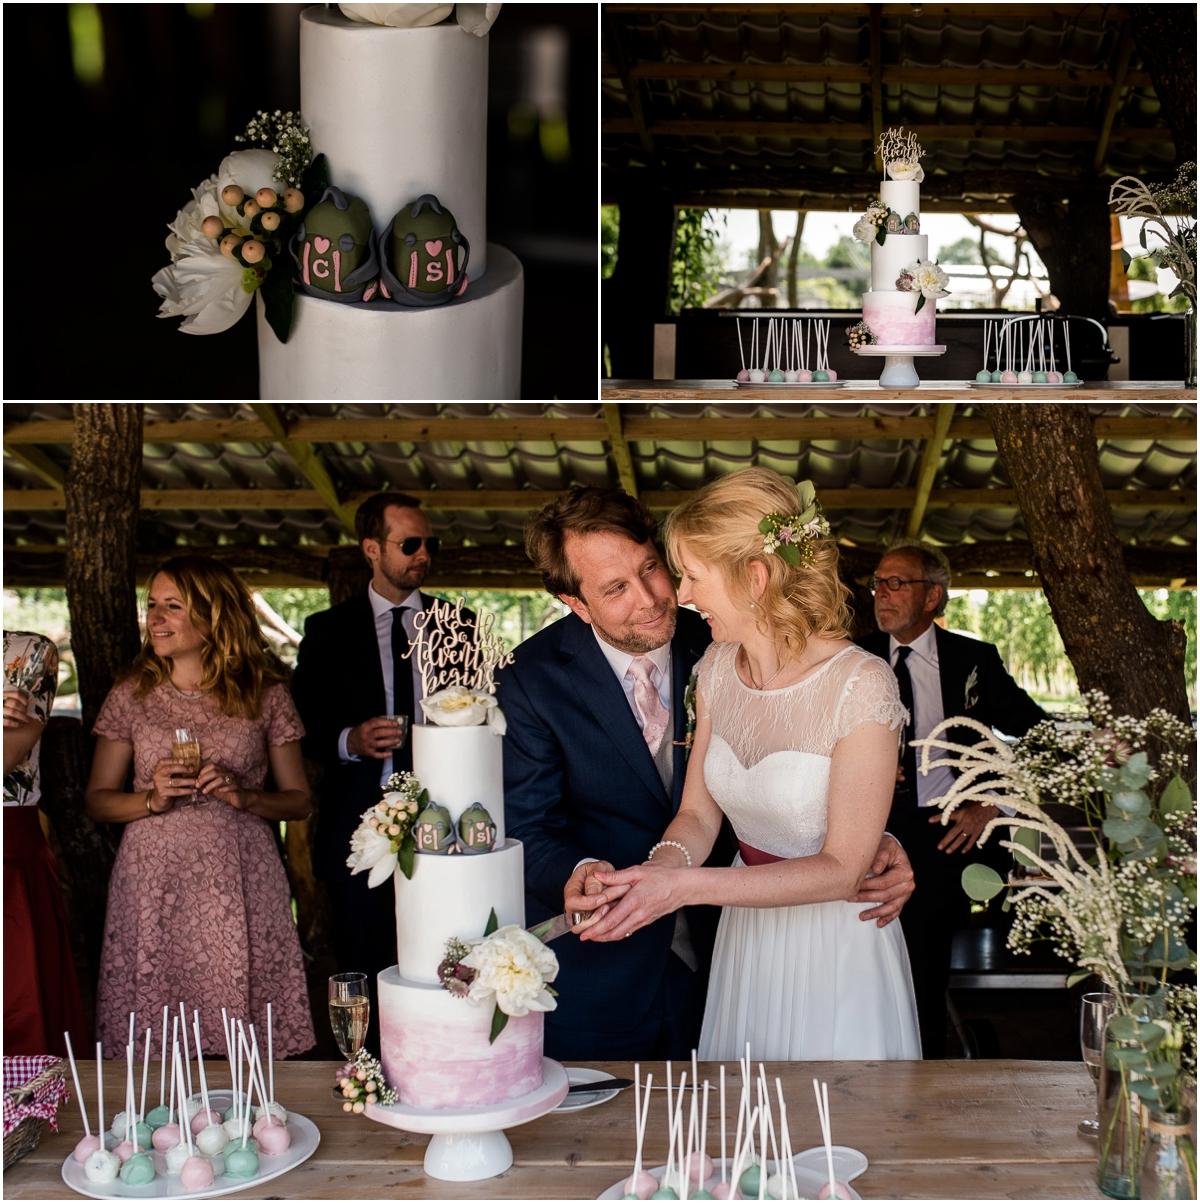 Dayofmylife-trouwen-fruittuinverbeek-bruidsfotograaf-wedding-germany-dutch13